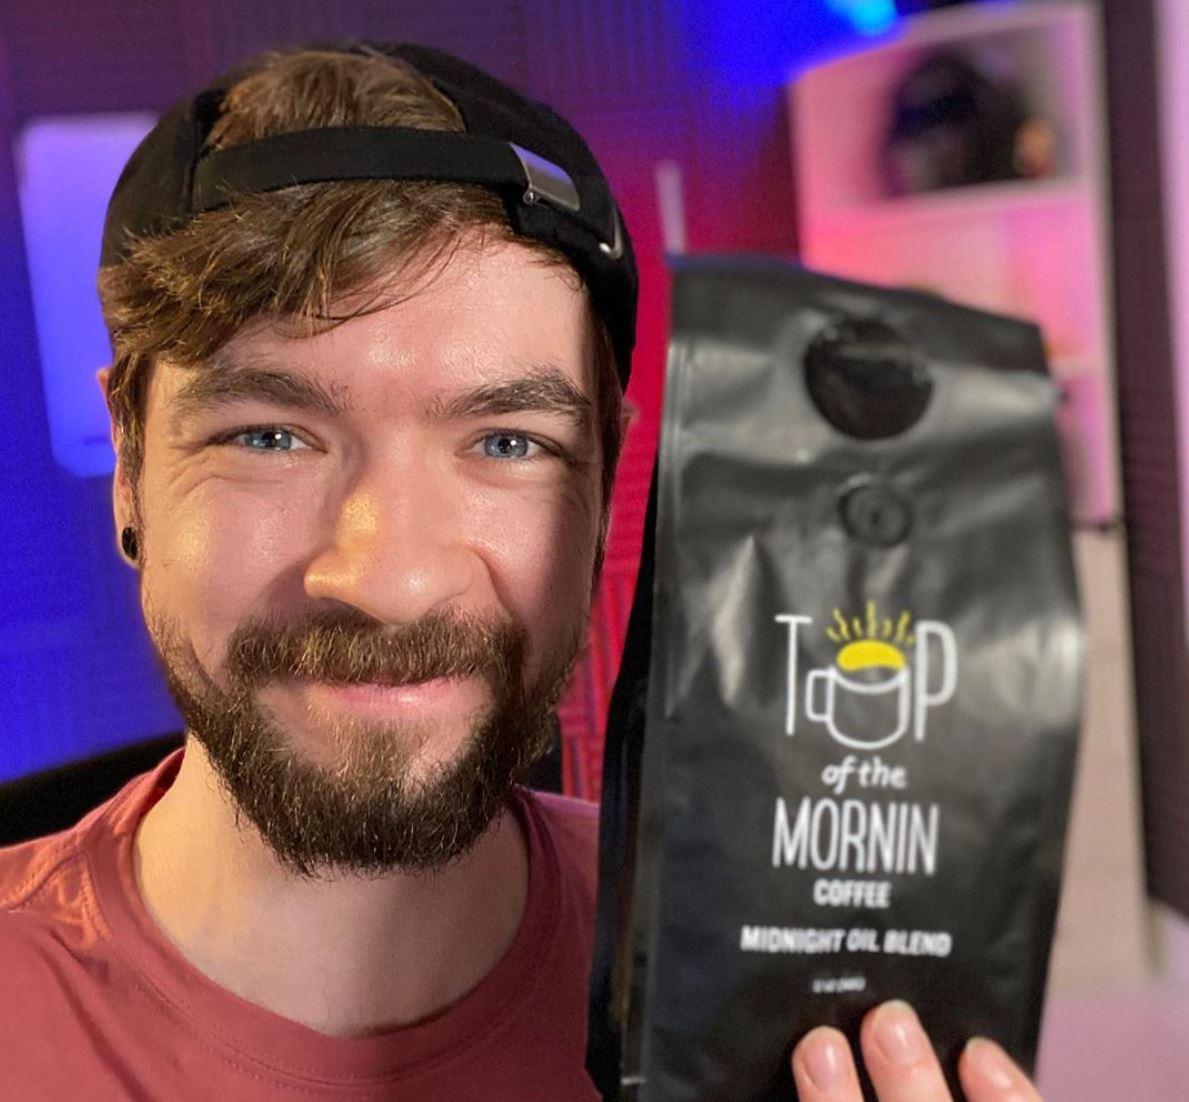 JackSepticEye Top O' the Morning Coffee